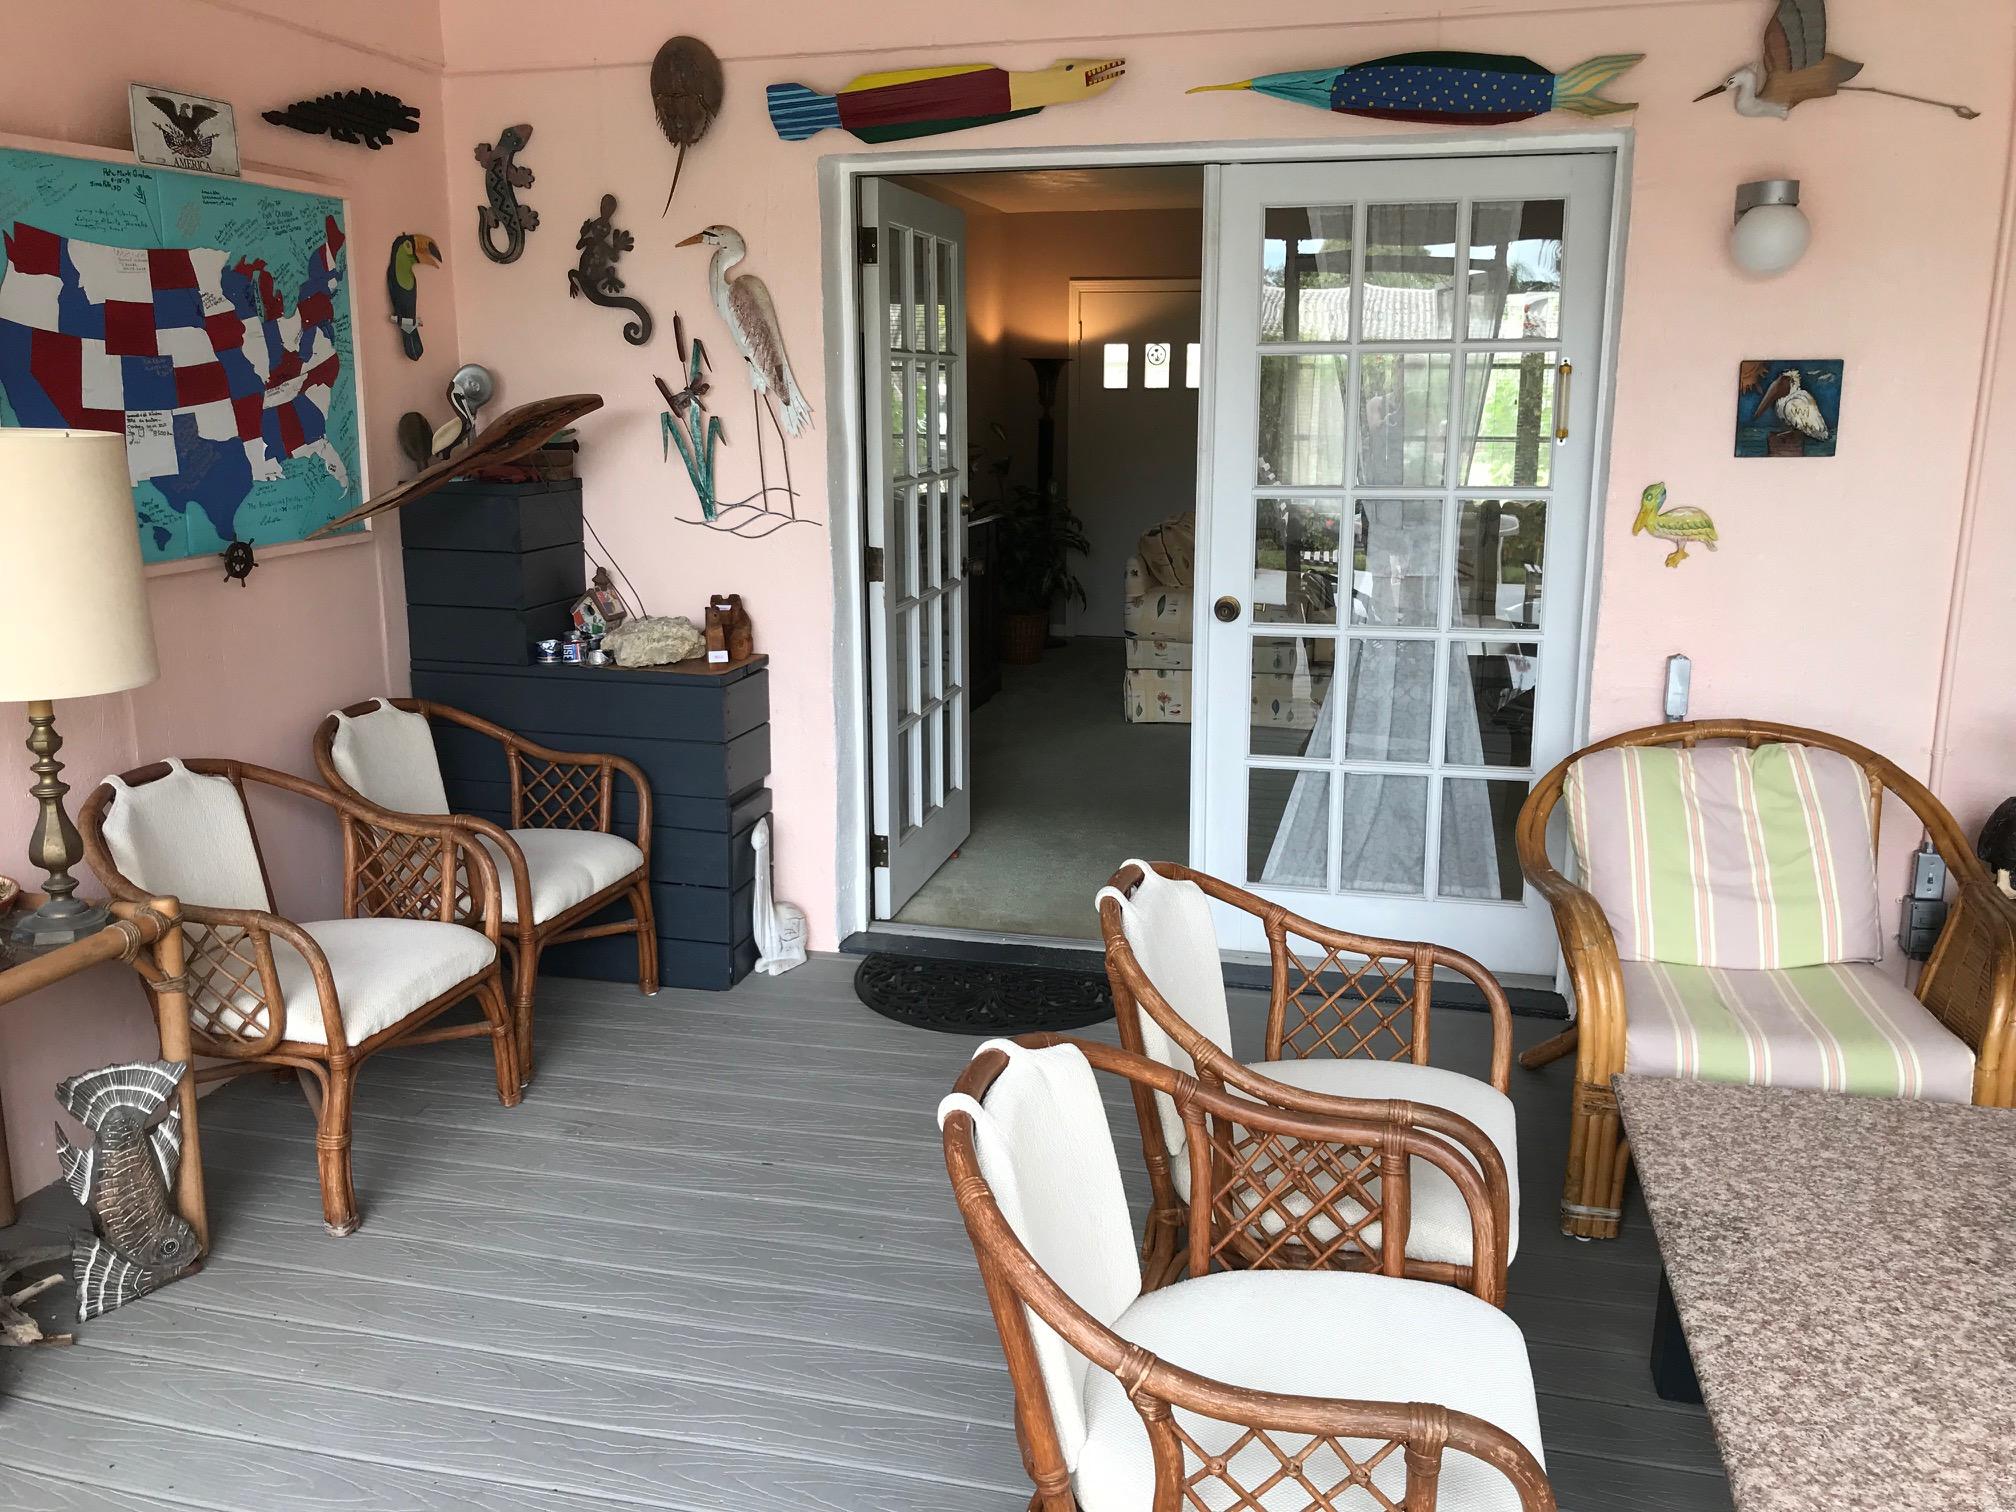 img 1365 copy immobilien florida kaufen verkaufen deutscher immobilienmakler florida. Black Bedroom Furniture Sets. Home Design Ideas